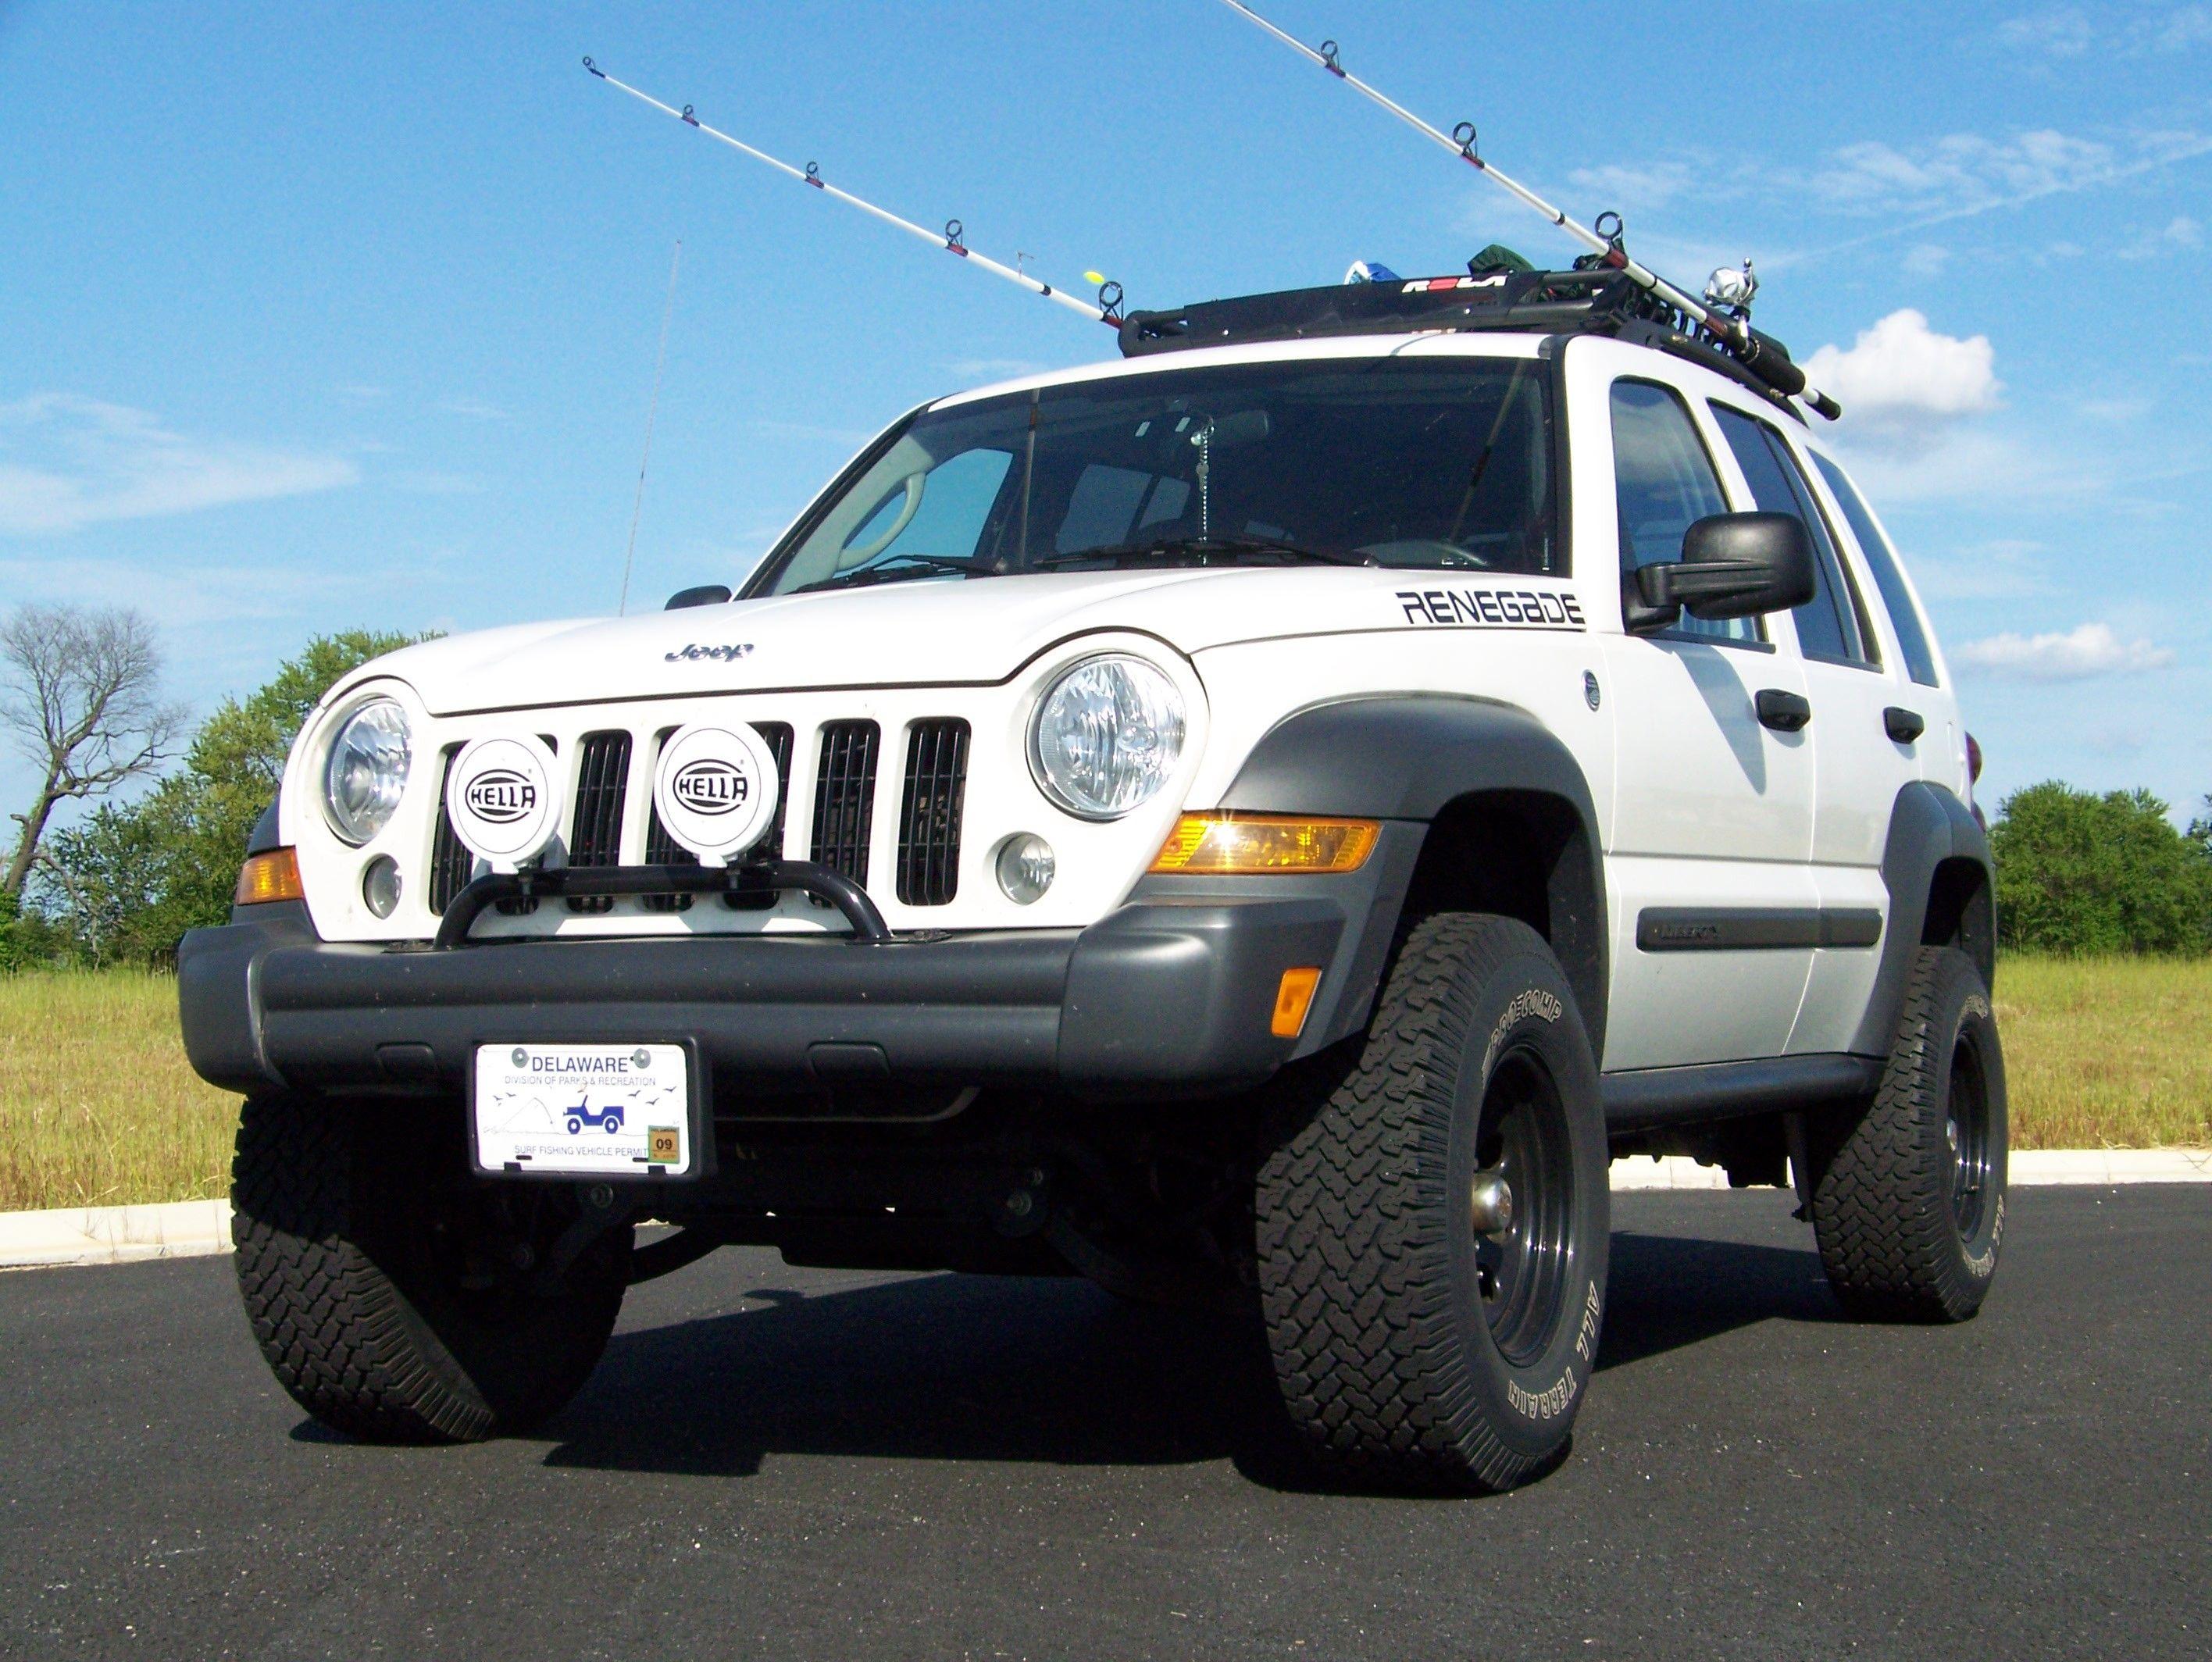 2006 Jeep Liberty Sport 2006 Jeep Liberty Jeep Jeep Liberty